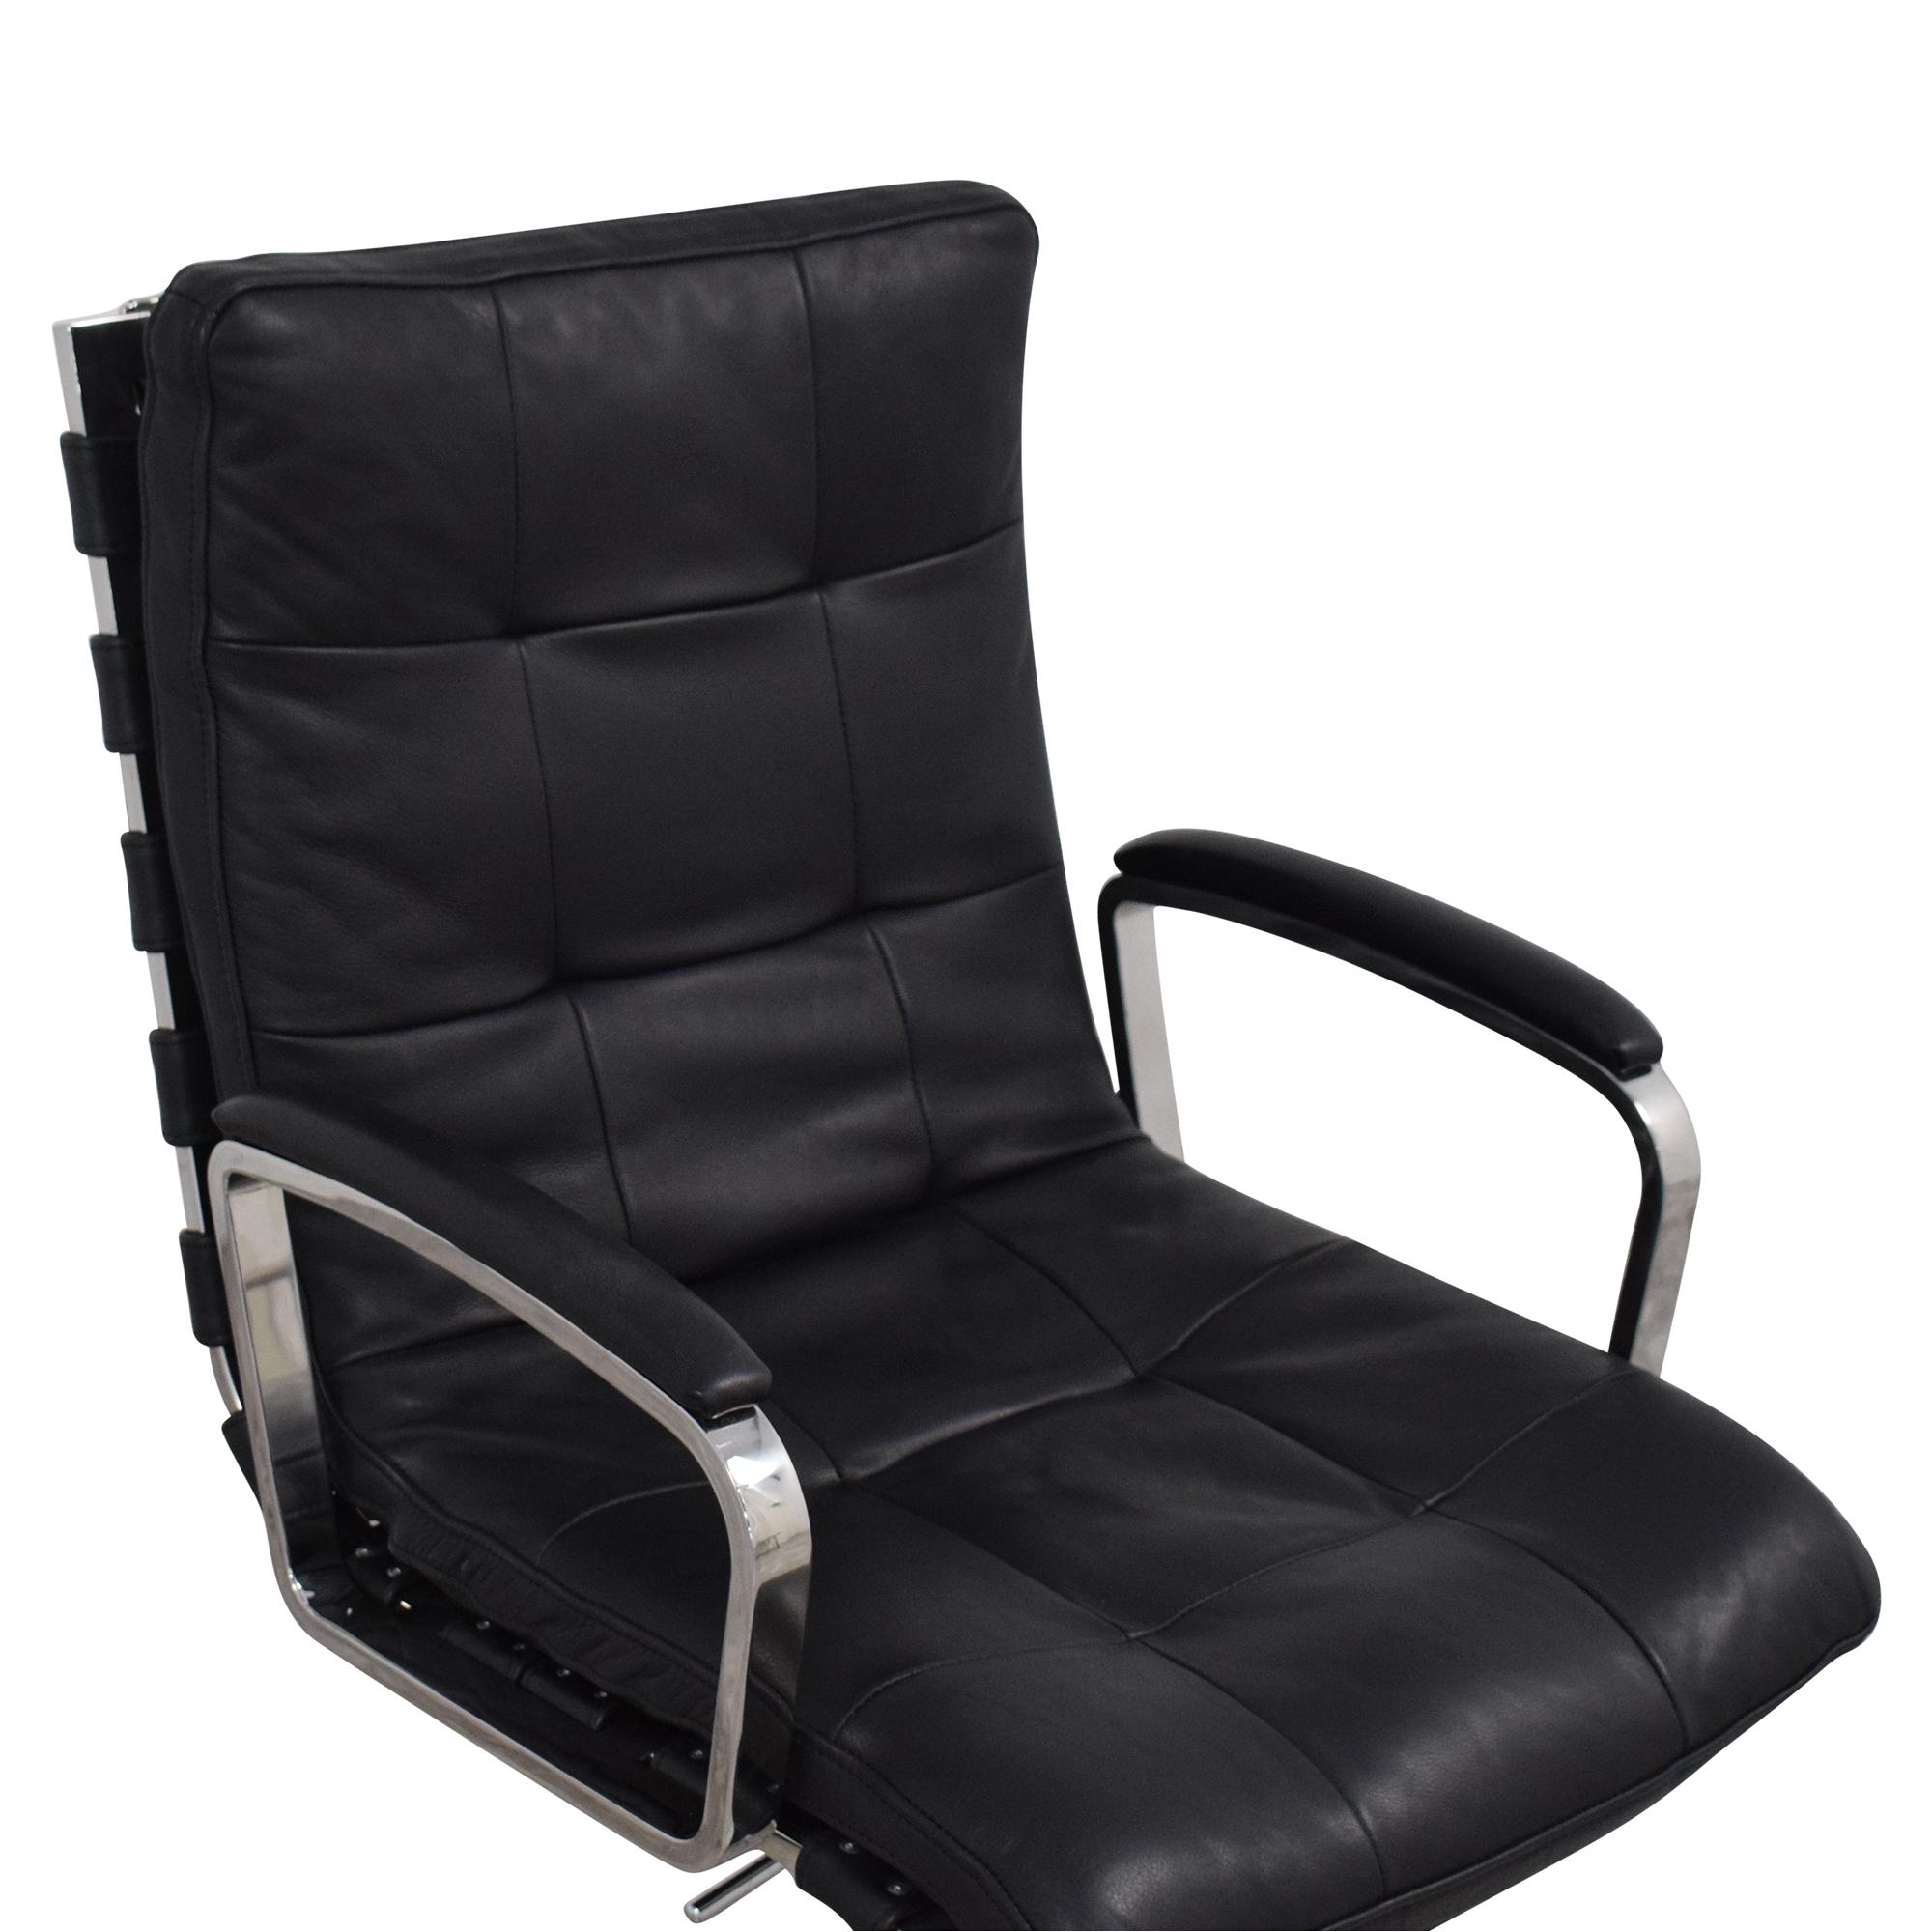 shop Restoration Hardware Rossi Desk Chair Restoration Hardware Home Office Chairs